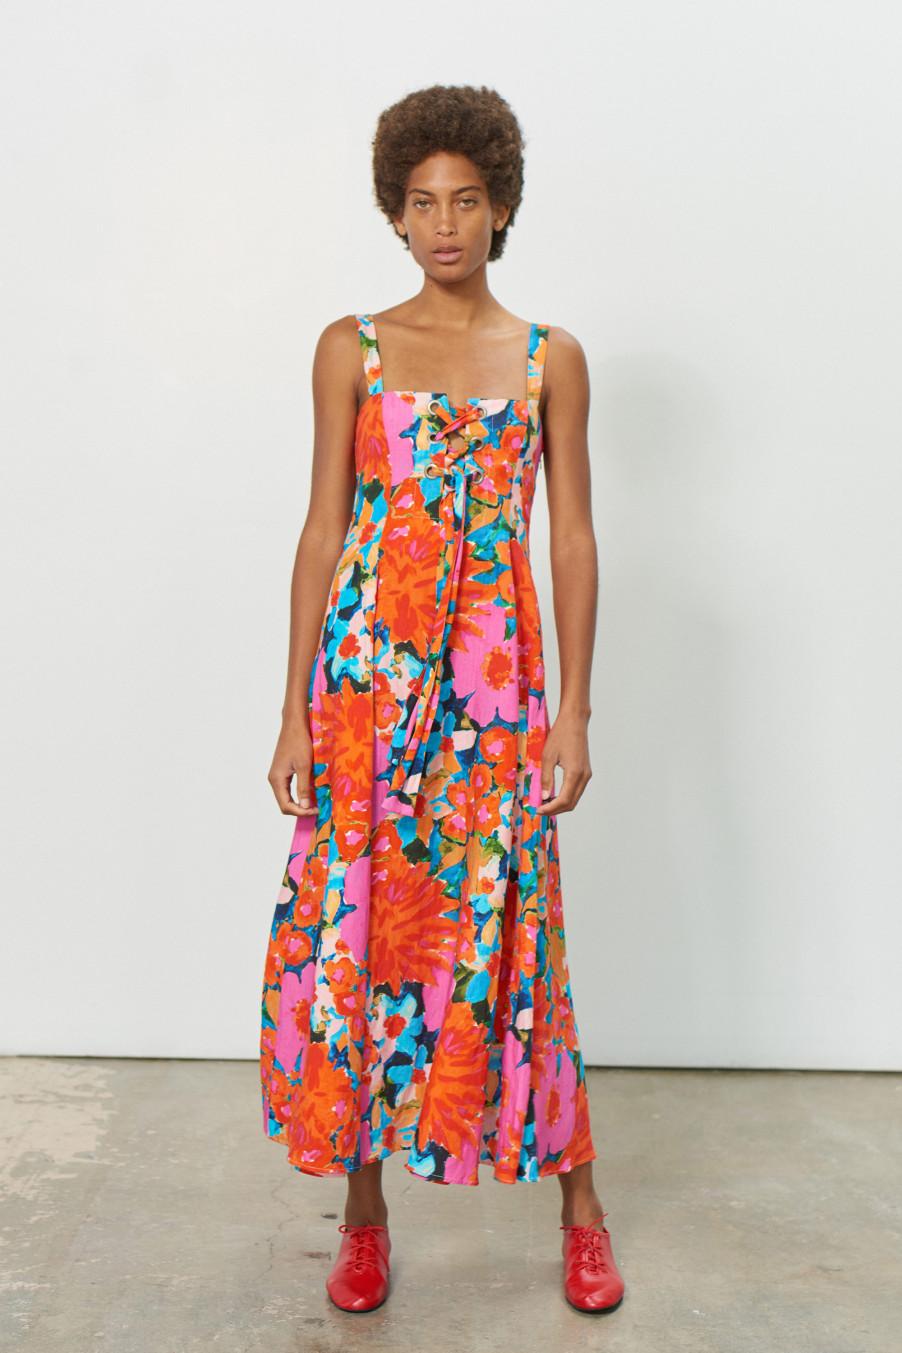 Eco-Friendly Floral Dress Spring Mara Hoffman